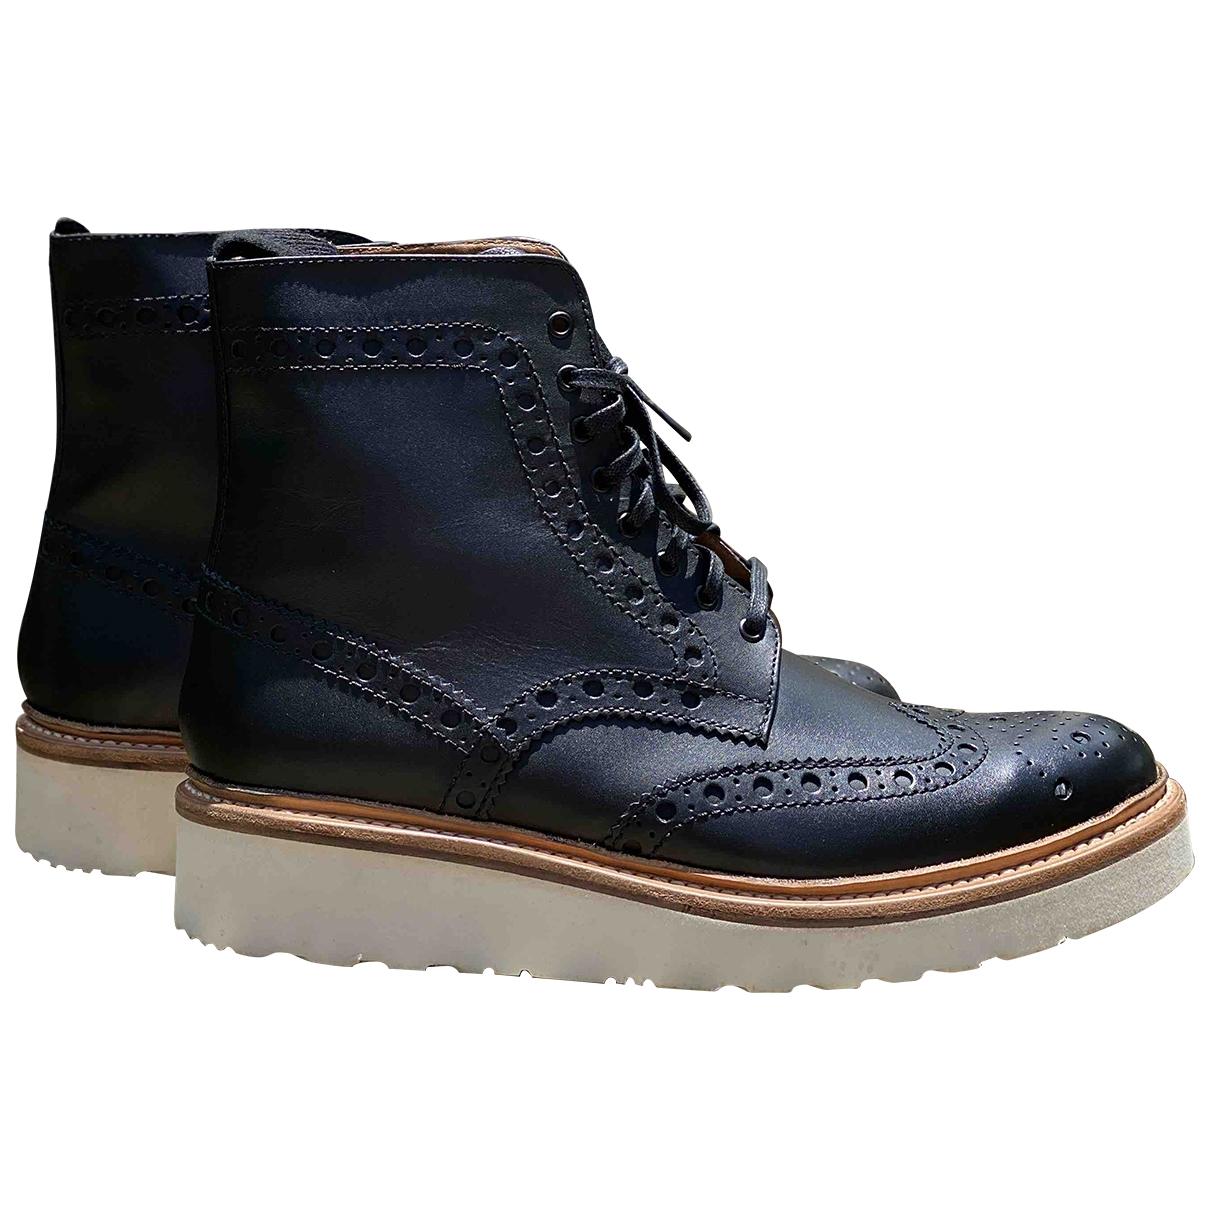 Grenson \N Black Leather Boots for Men 7.5 UK